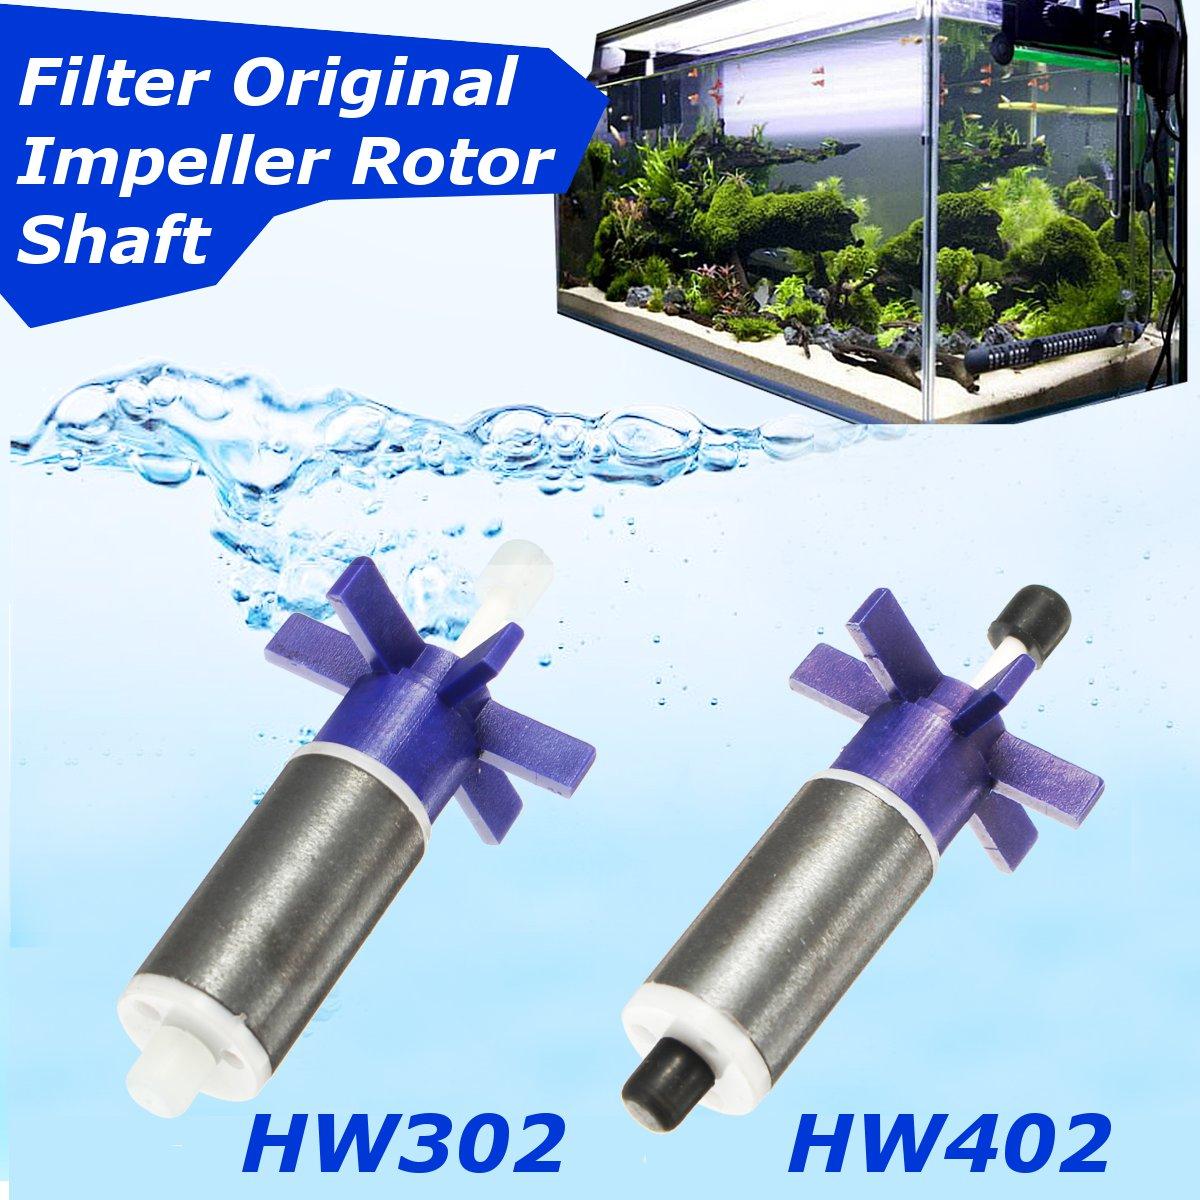 Accesorios de filtros para bomba de agua, impulsor de filtro cilíndrico, eje...